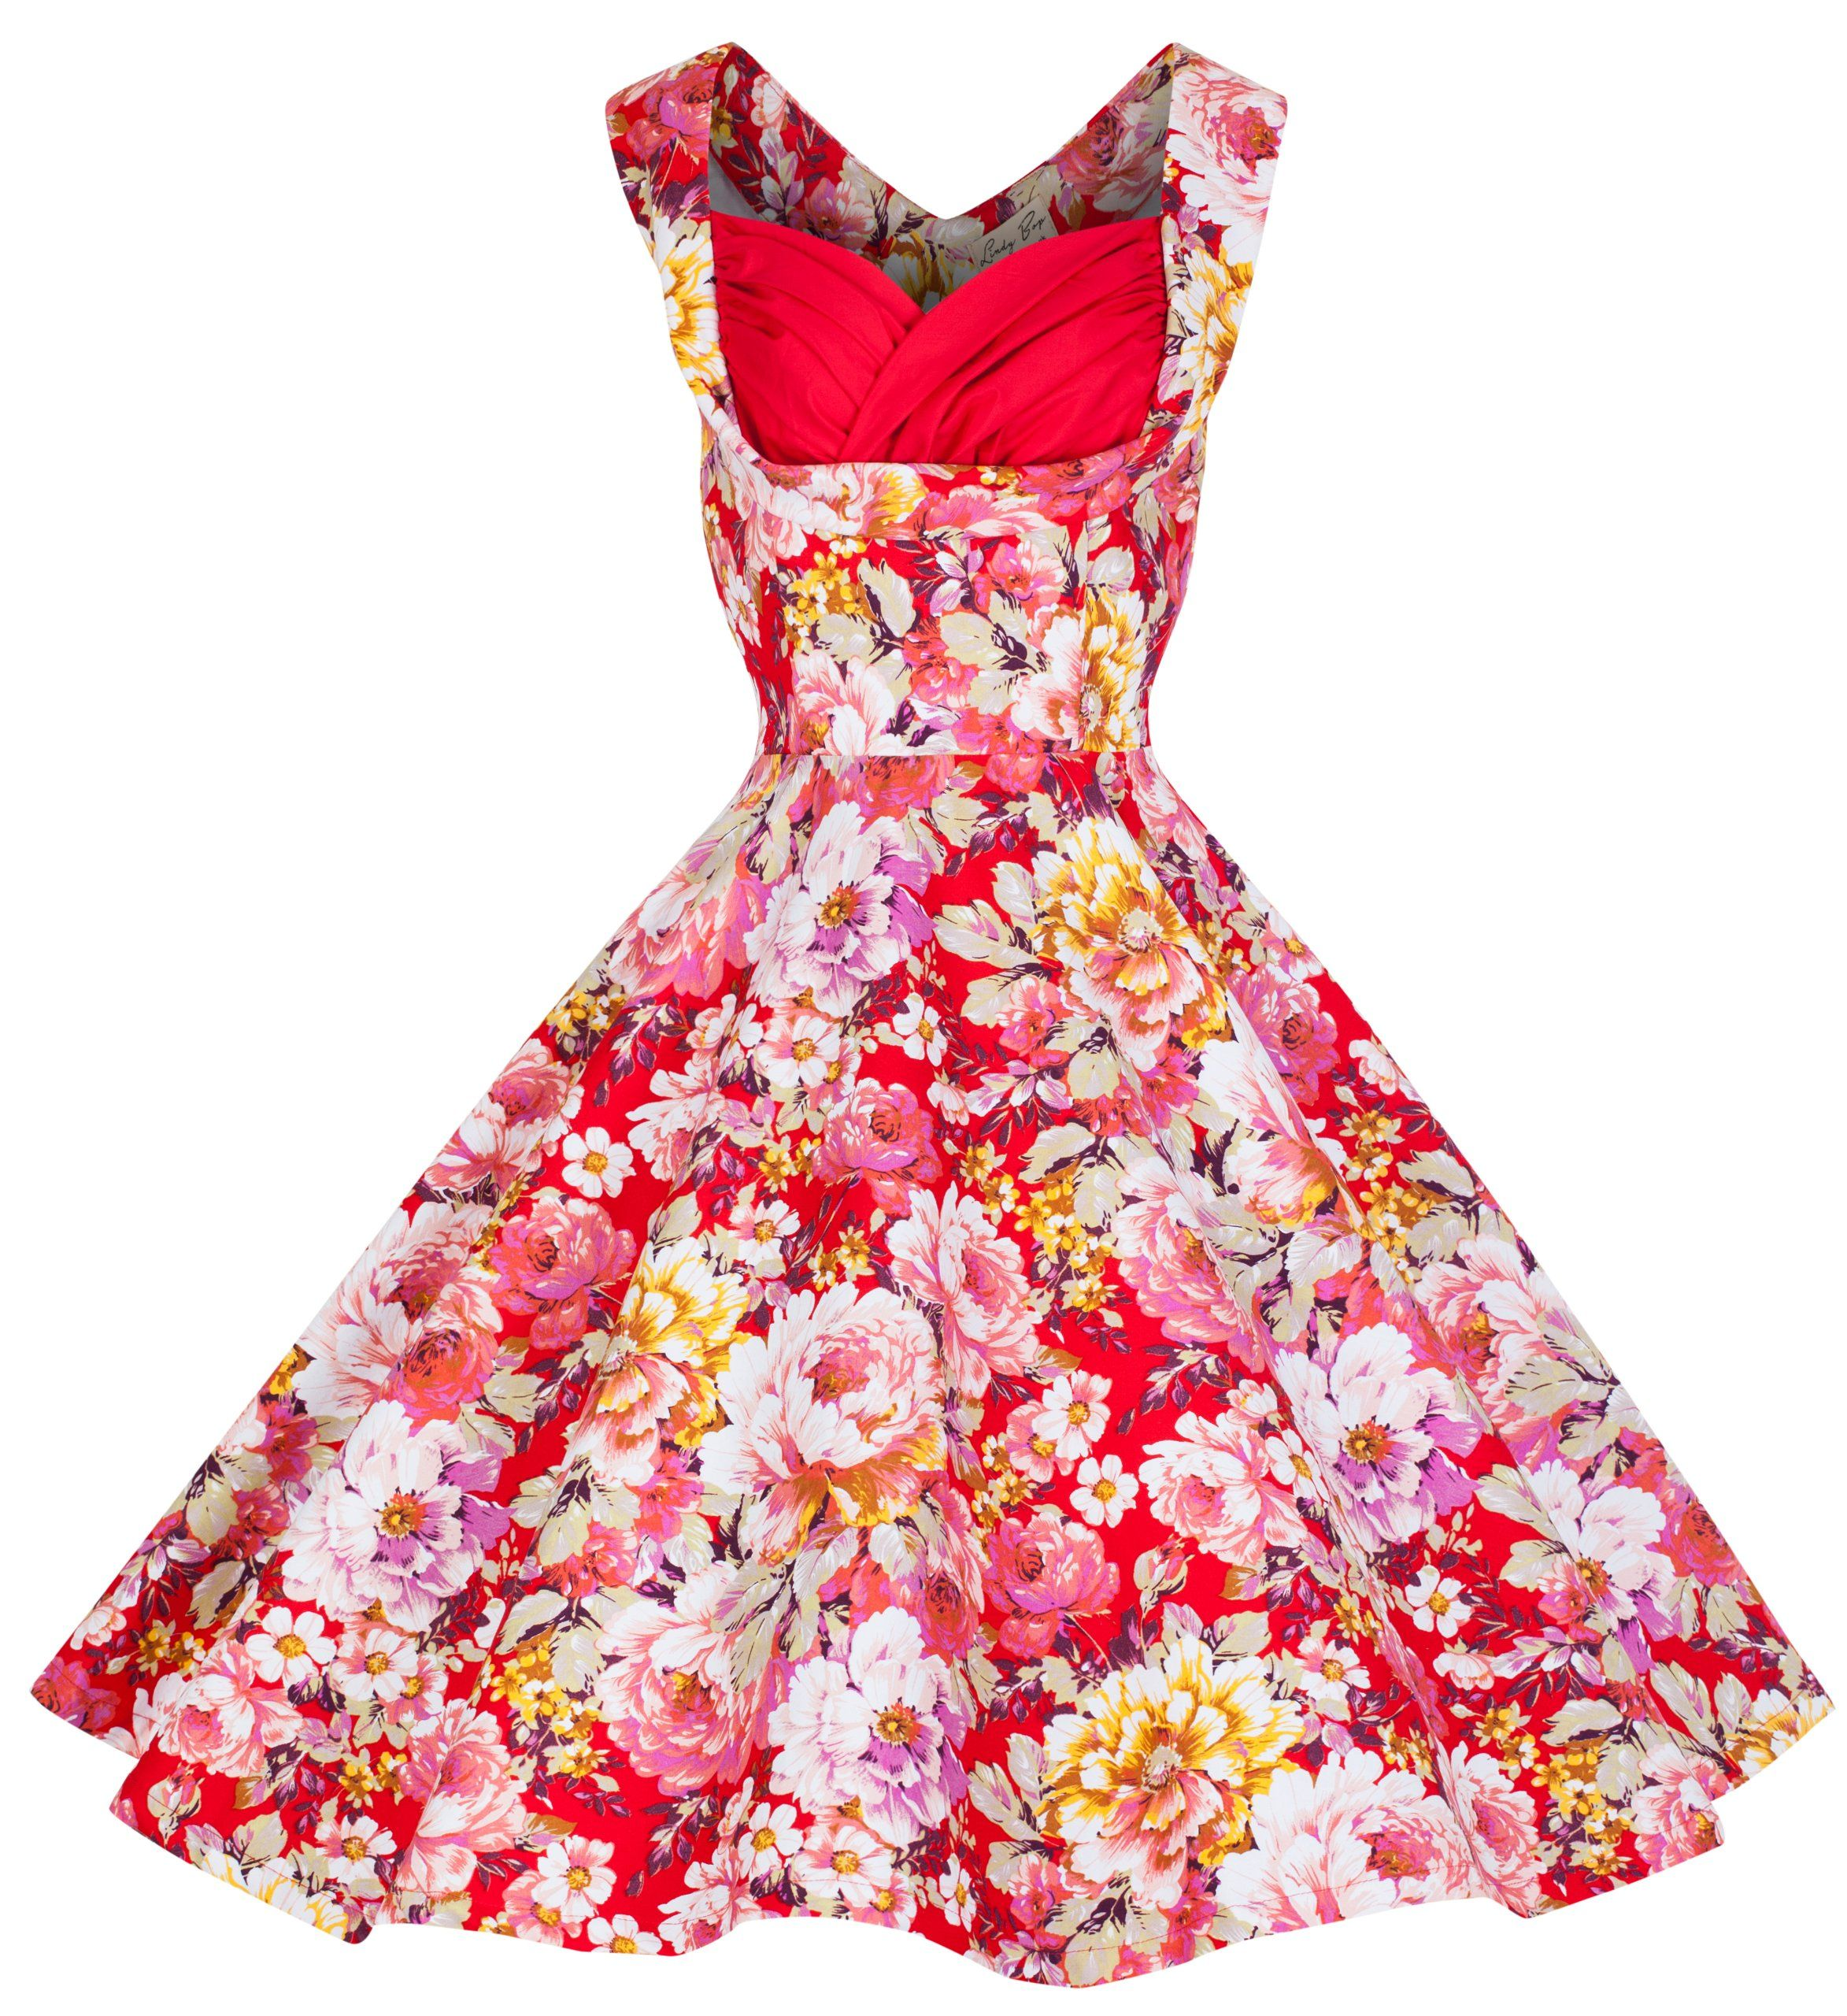 Lindy Bop \'Ophelia\' Vintage 1950\'s Floral Spring Garden Party Picnic ...